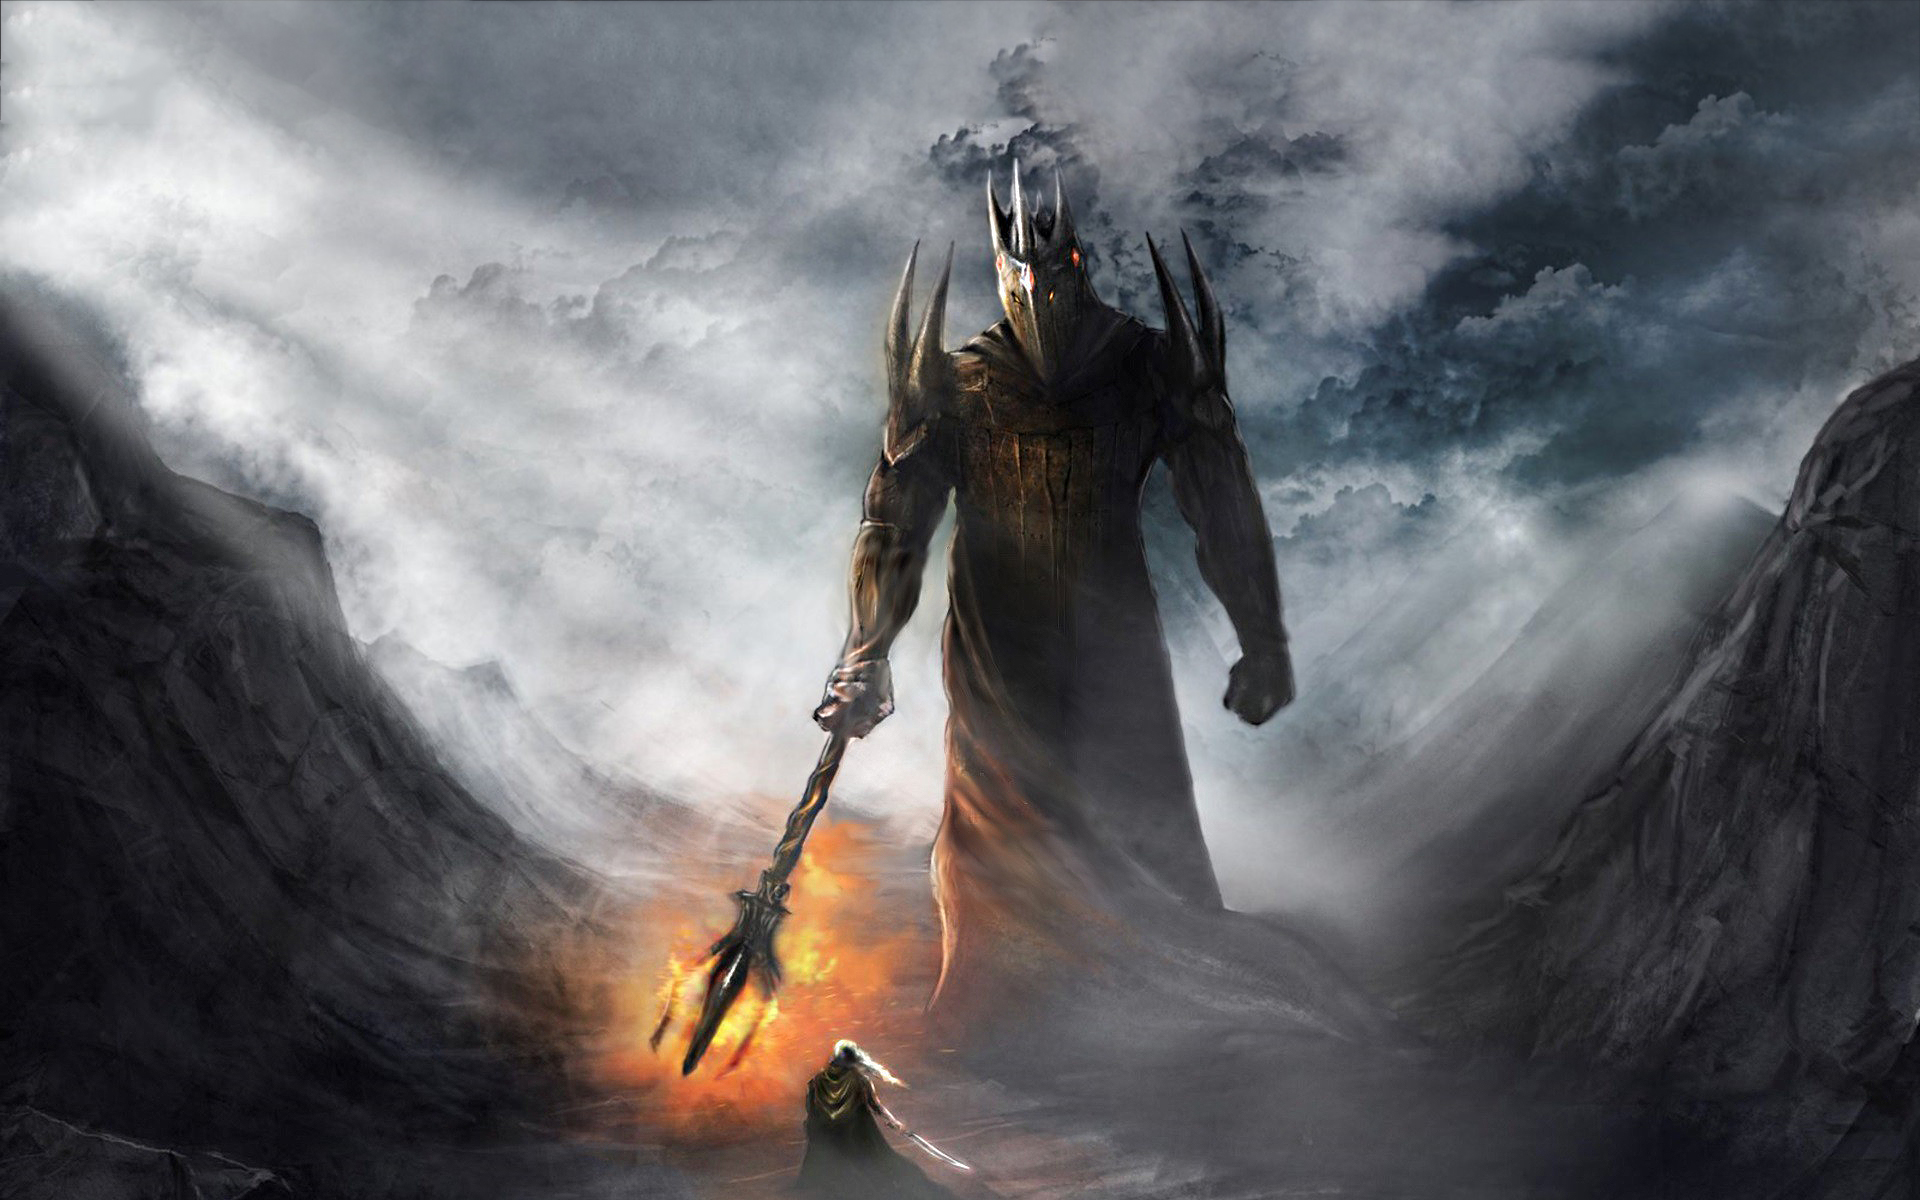 Dark lord morgoth vs fingolfin